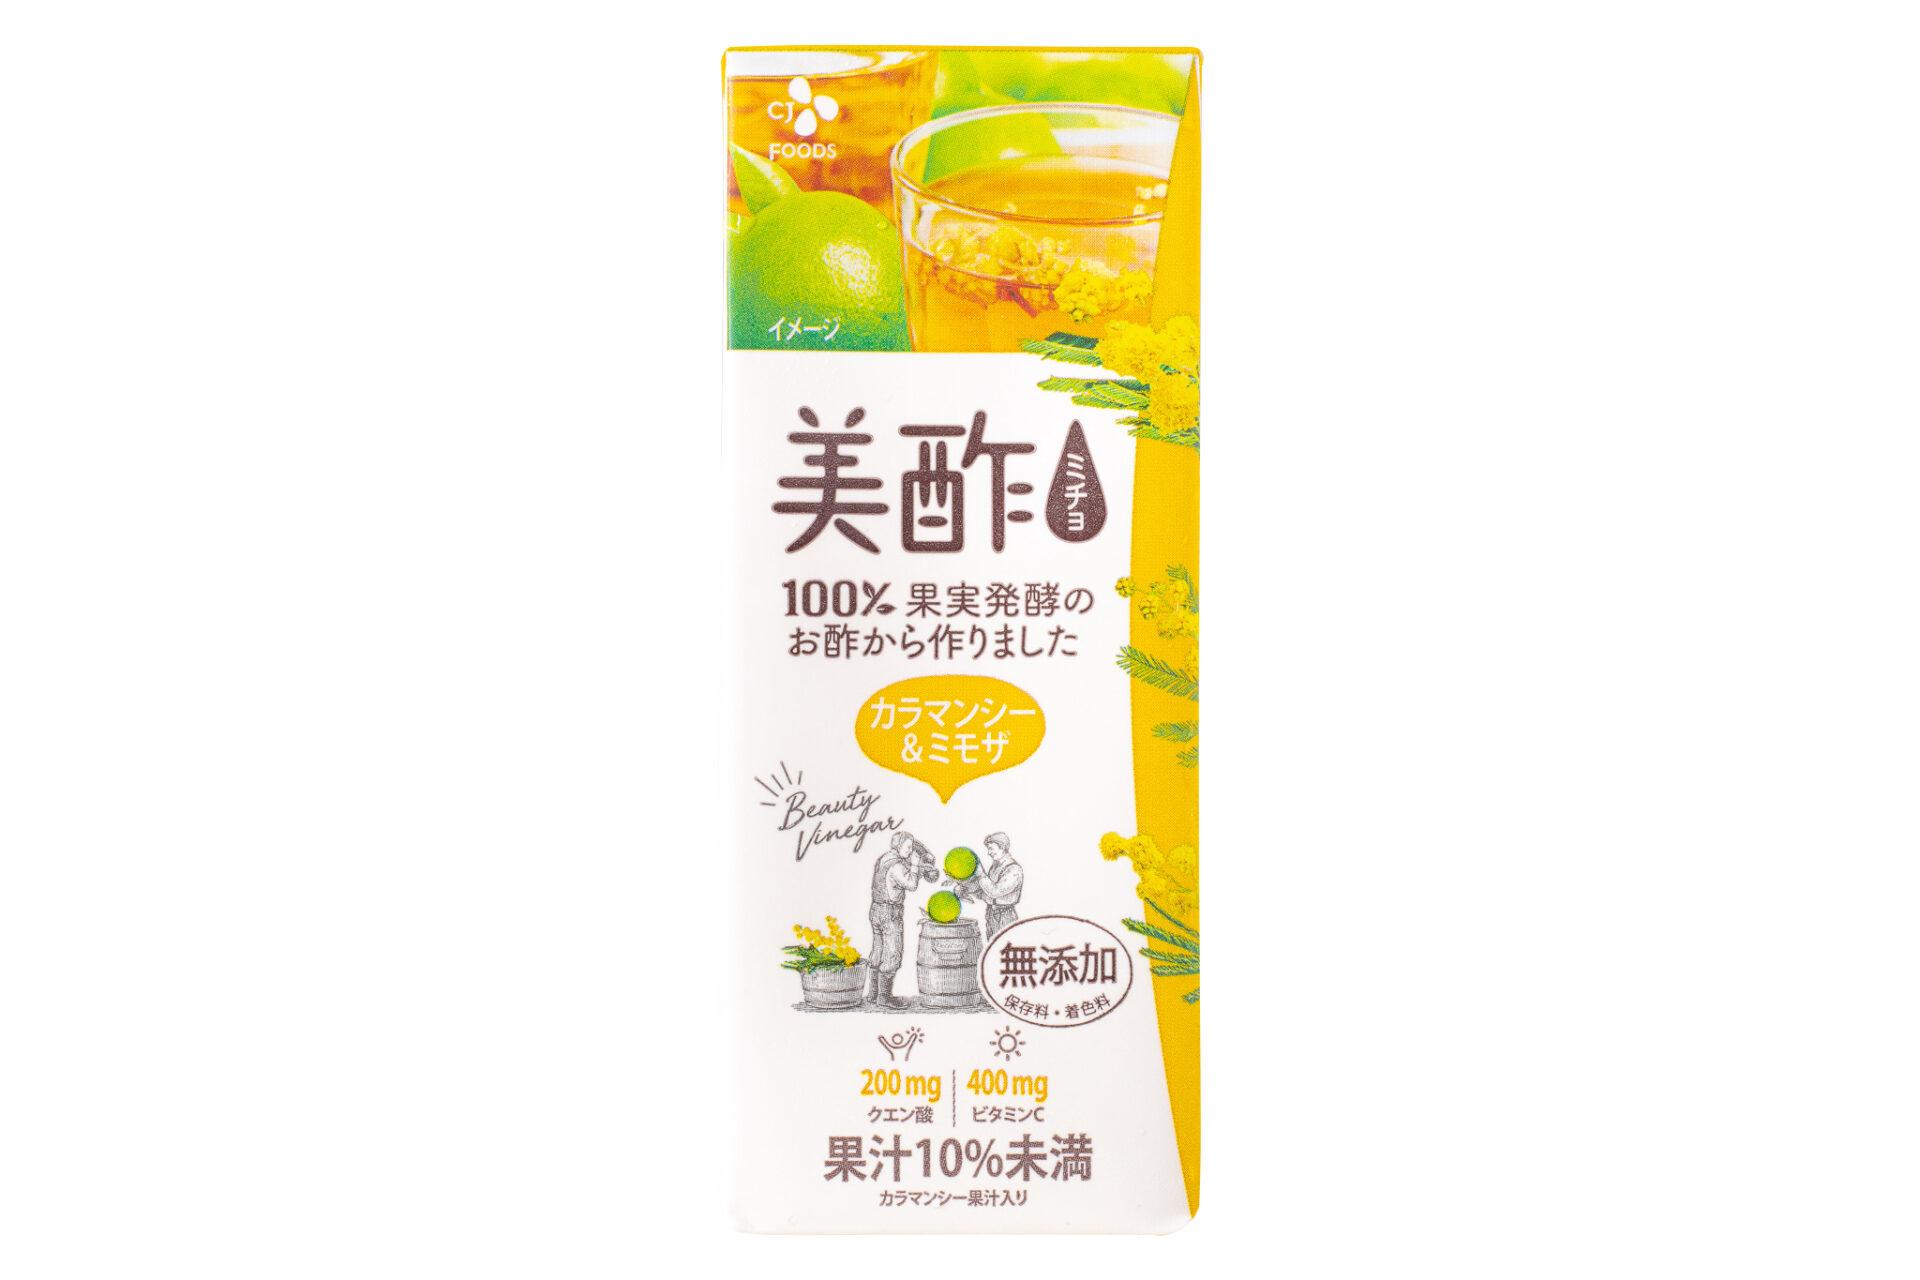 CJ FOODS JAPAN『美酢 カラマンシー&ミモザ 200ml』